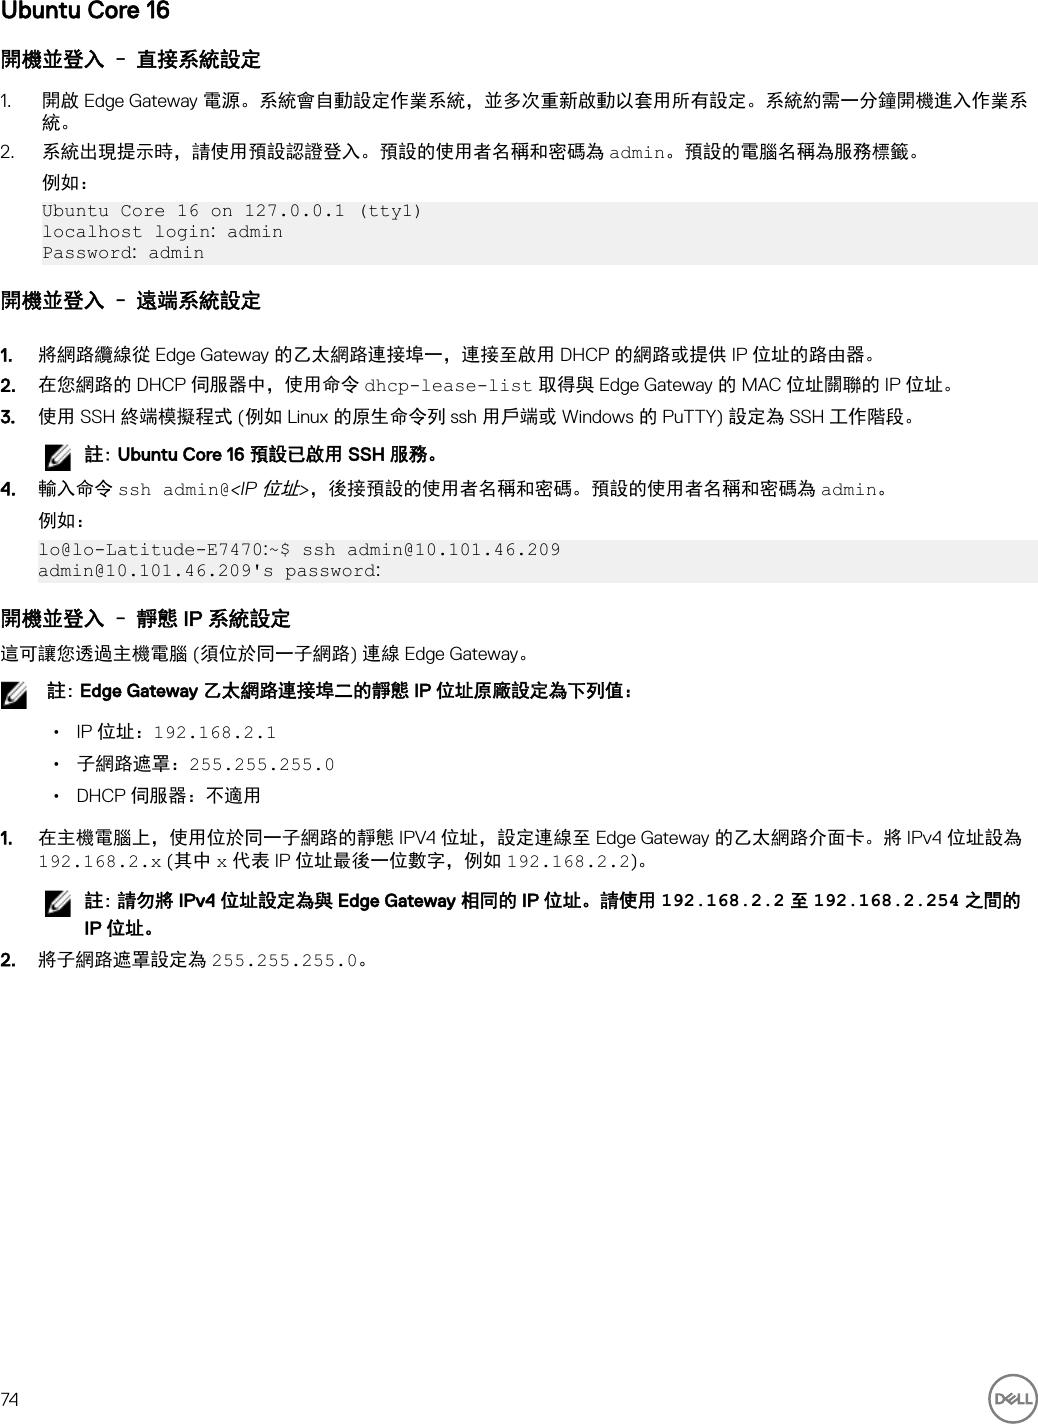 Dell edge gateway 3000 series 維修手冊使用手册其他文件